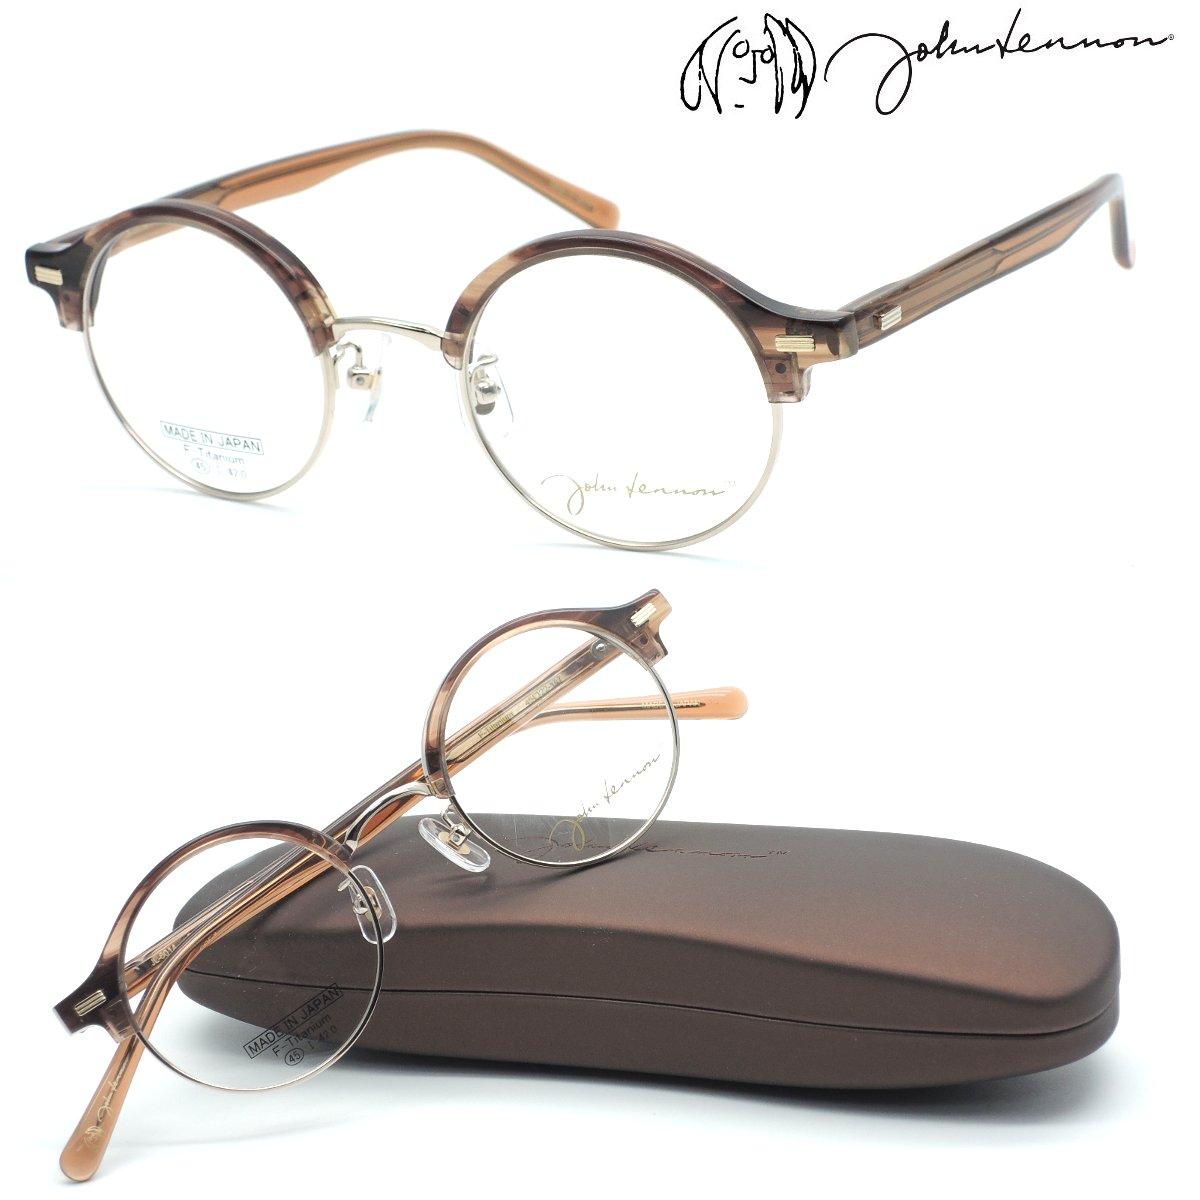 【john lennon】ジョンレノン JL-6014 col.4 メガネ 度付又は度無レンズセット 日本製 【正規品】【店内全品送料無料】【丸メガネ】